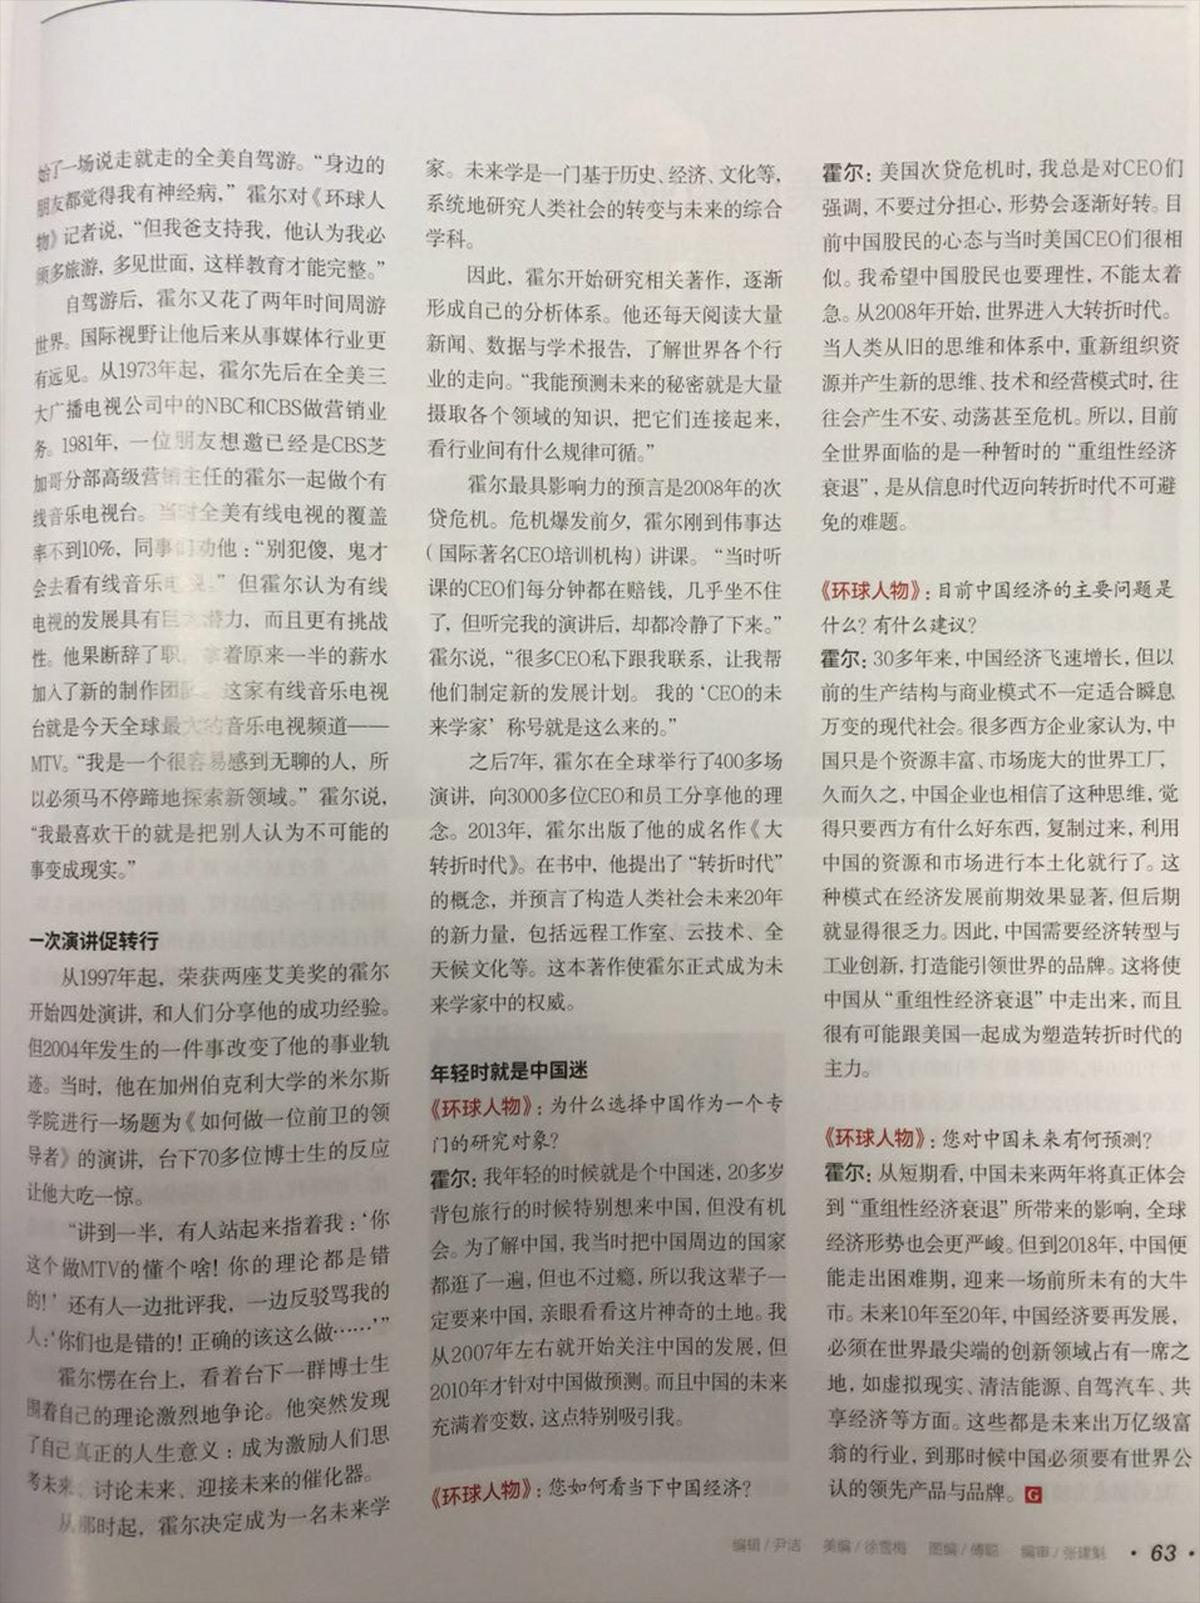 Microsoft Word - Global People article.docx